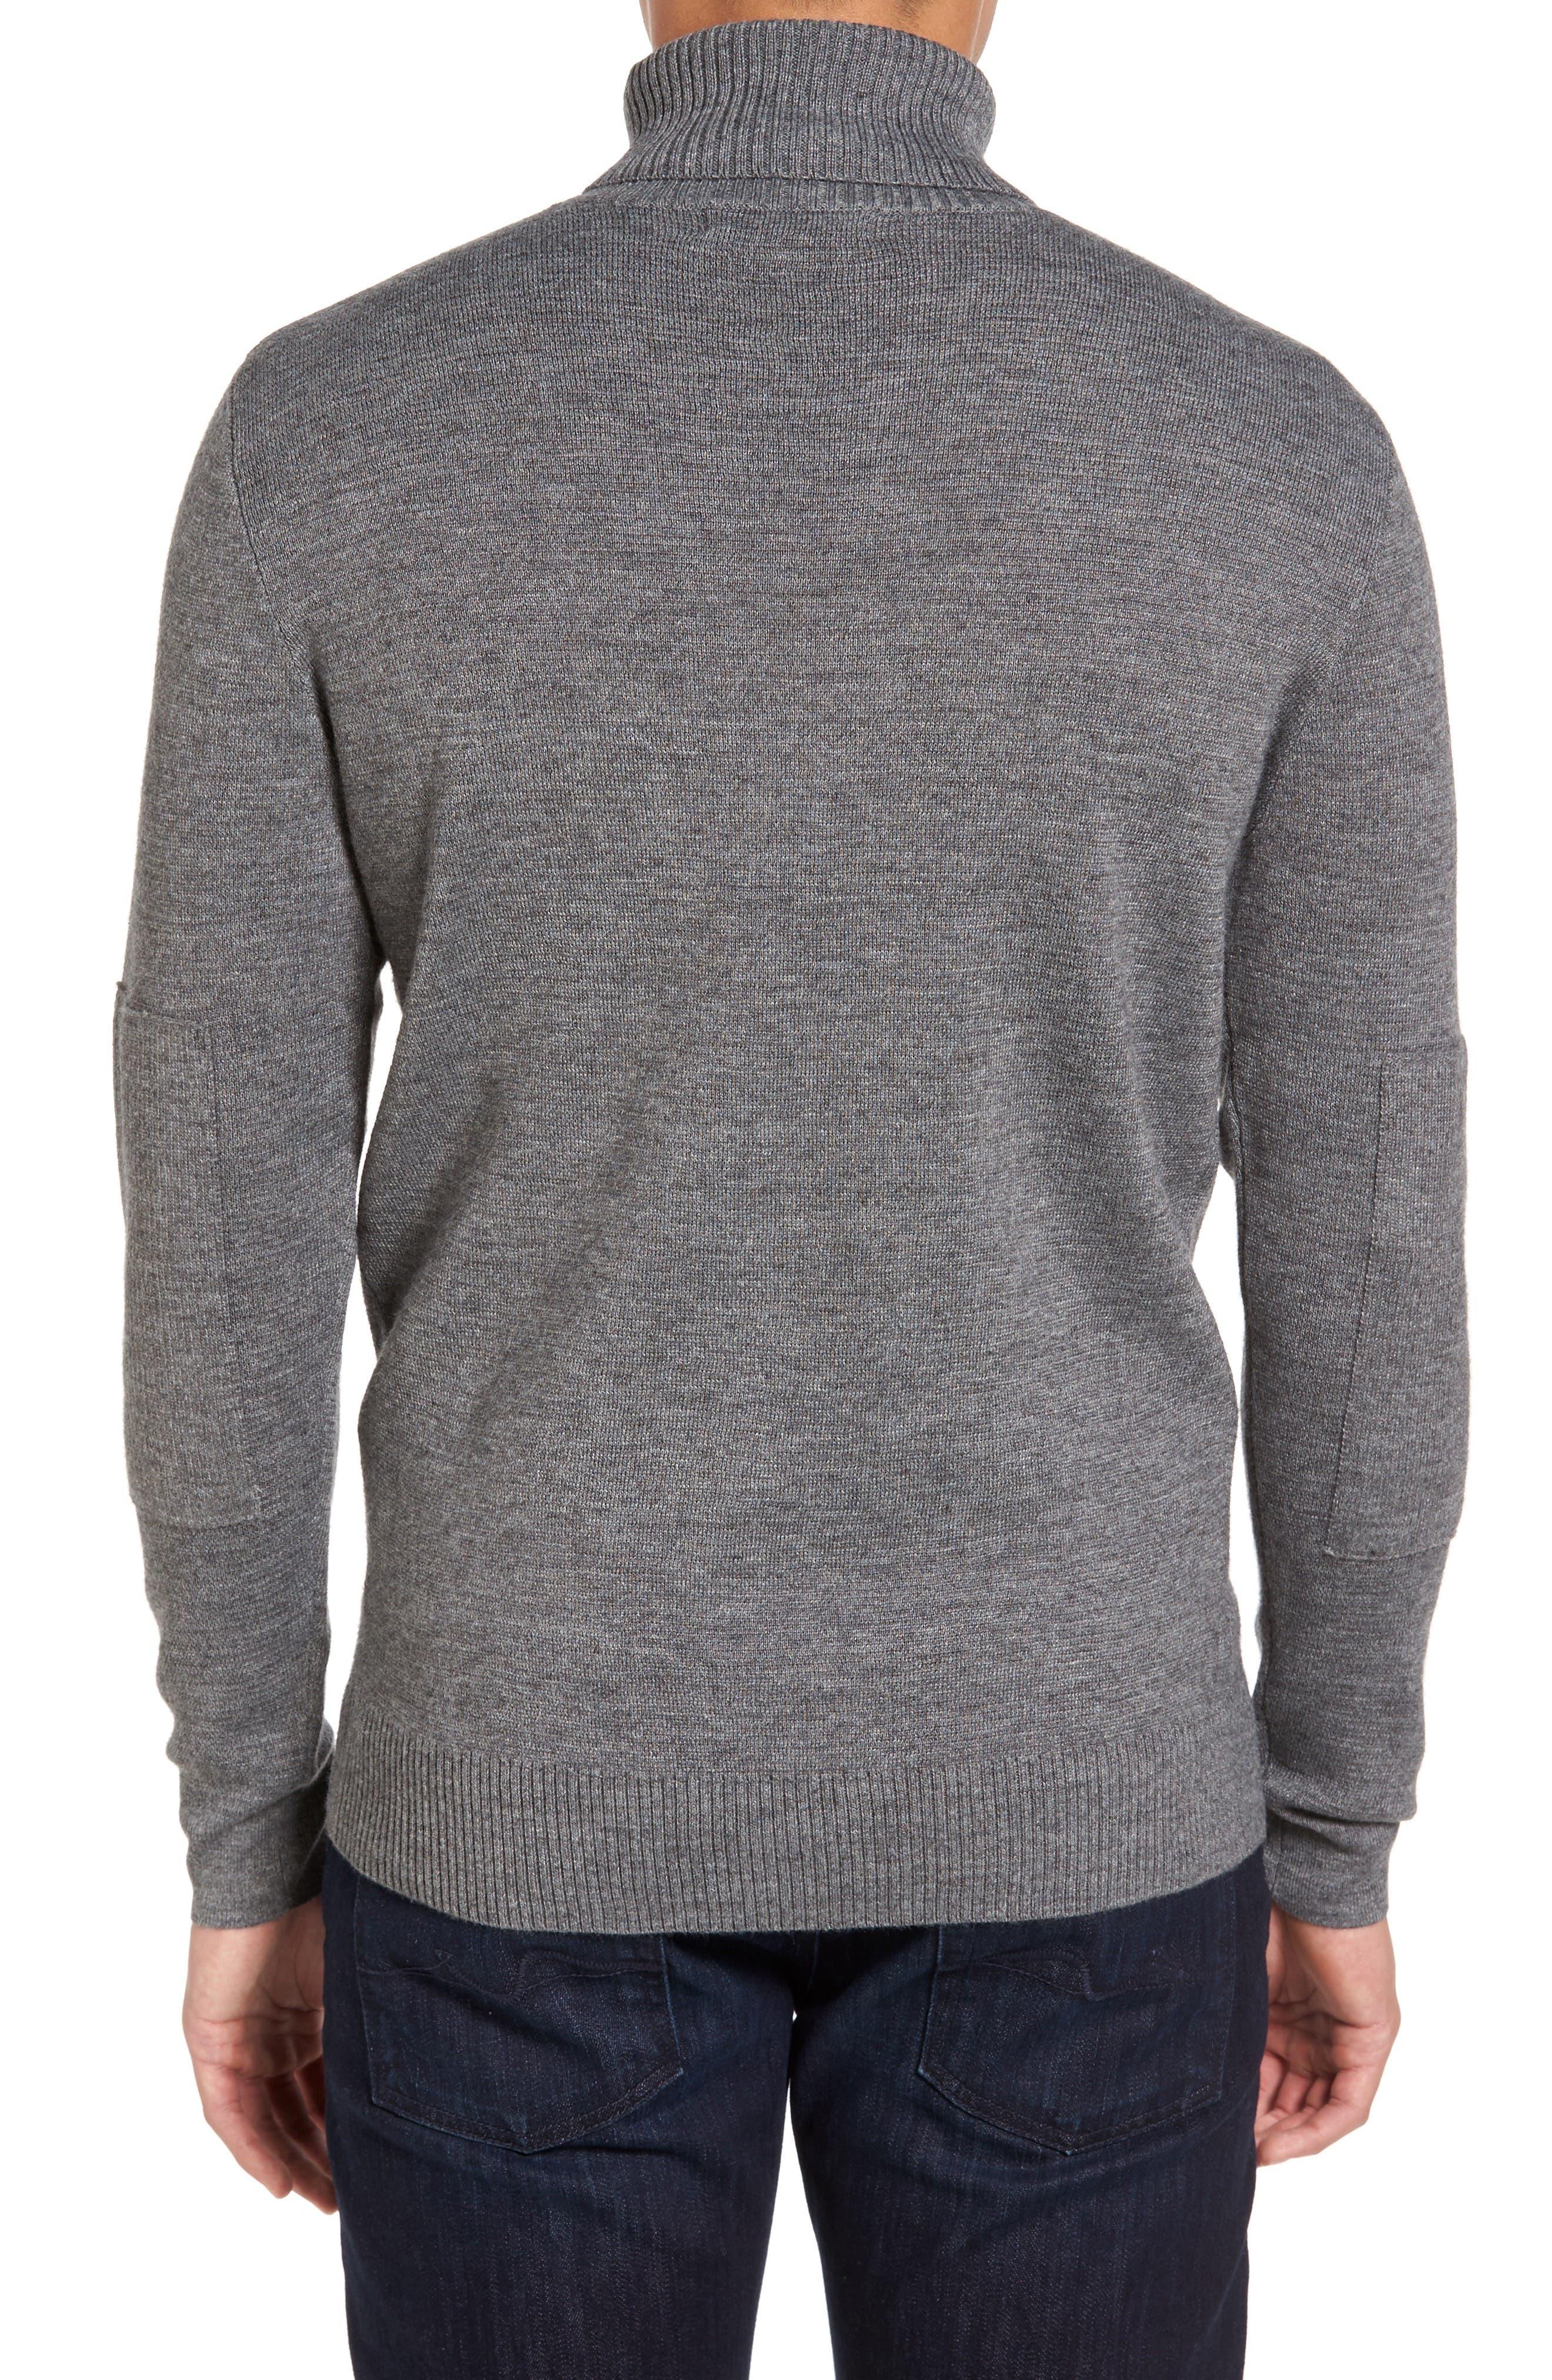 Merino Wool Blend Turtleneck Sweater,                             Alternate thumbnail 2, color,                             020